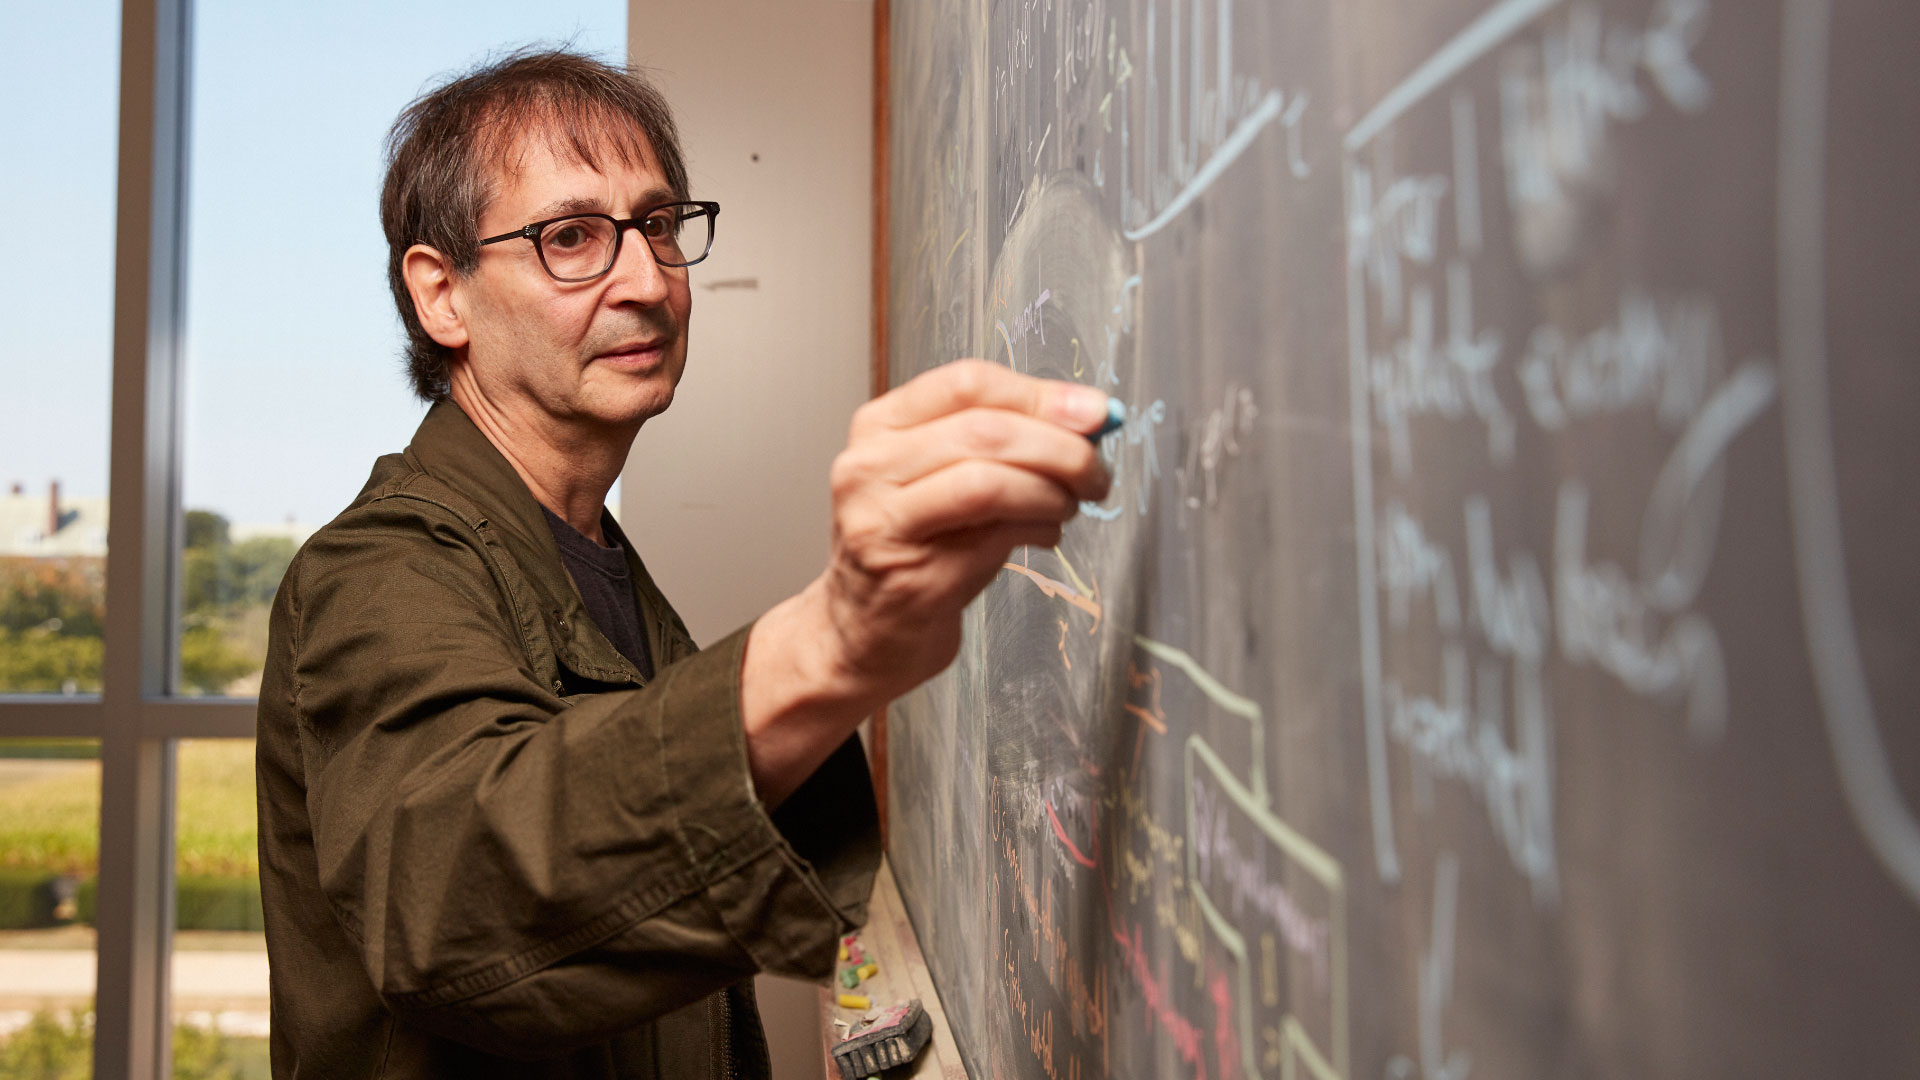 Nigel Goldenfeld: Seeing Emergent Physics Behind Evolution | Quanta Magazine